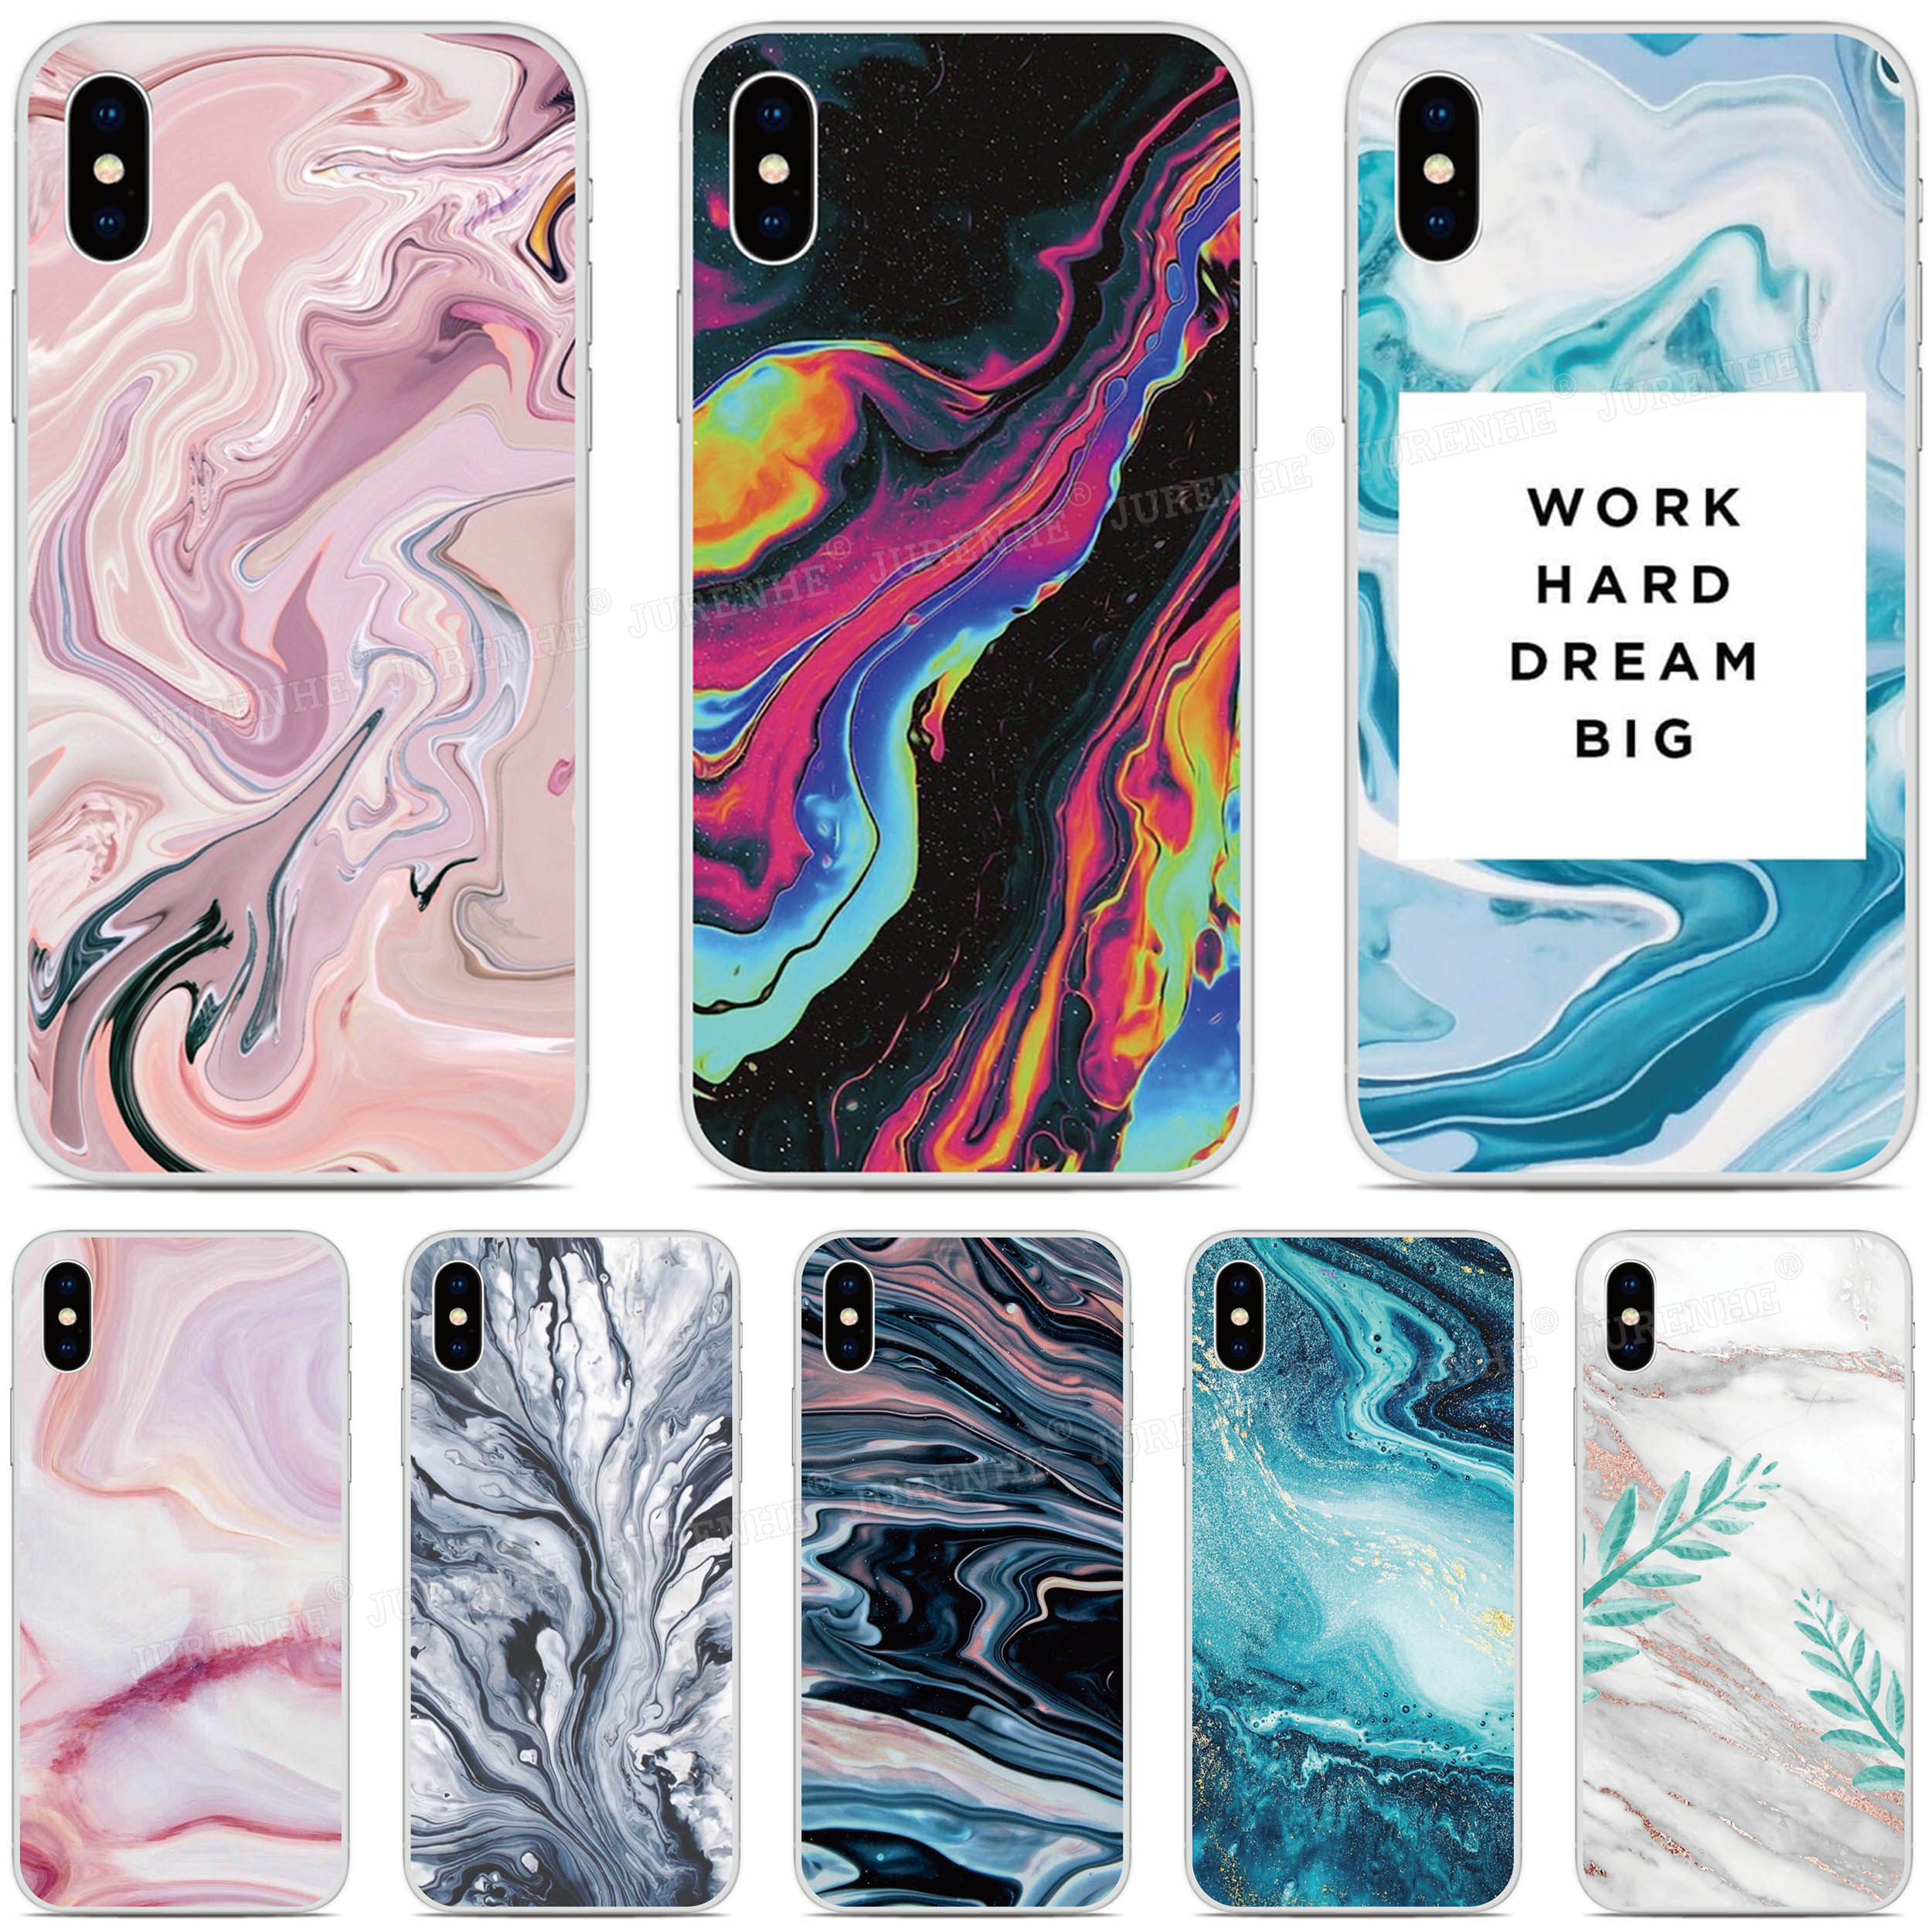 Marble Skin Pattern Phone Case For BlackBerry KEYone KEY 2 Priv Motion Passport Q30 Z10 Z30 Q10 DTEK50 DTEK60 DTEK70 tpu Cover(China)